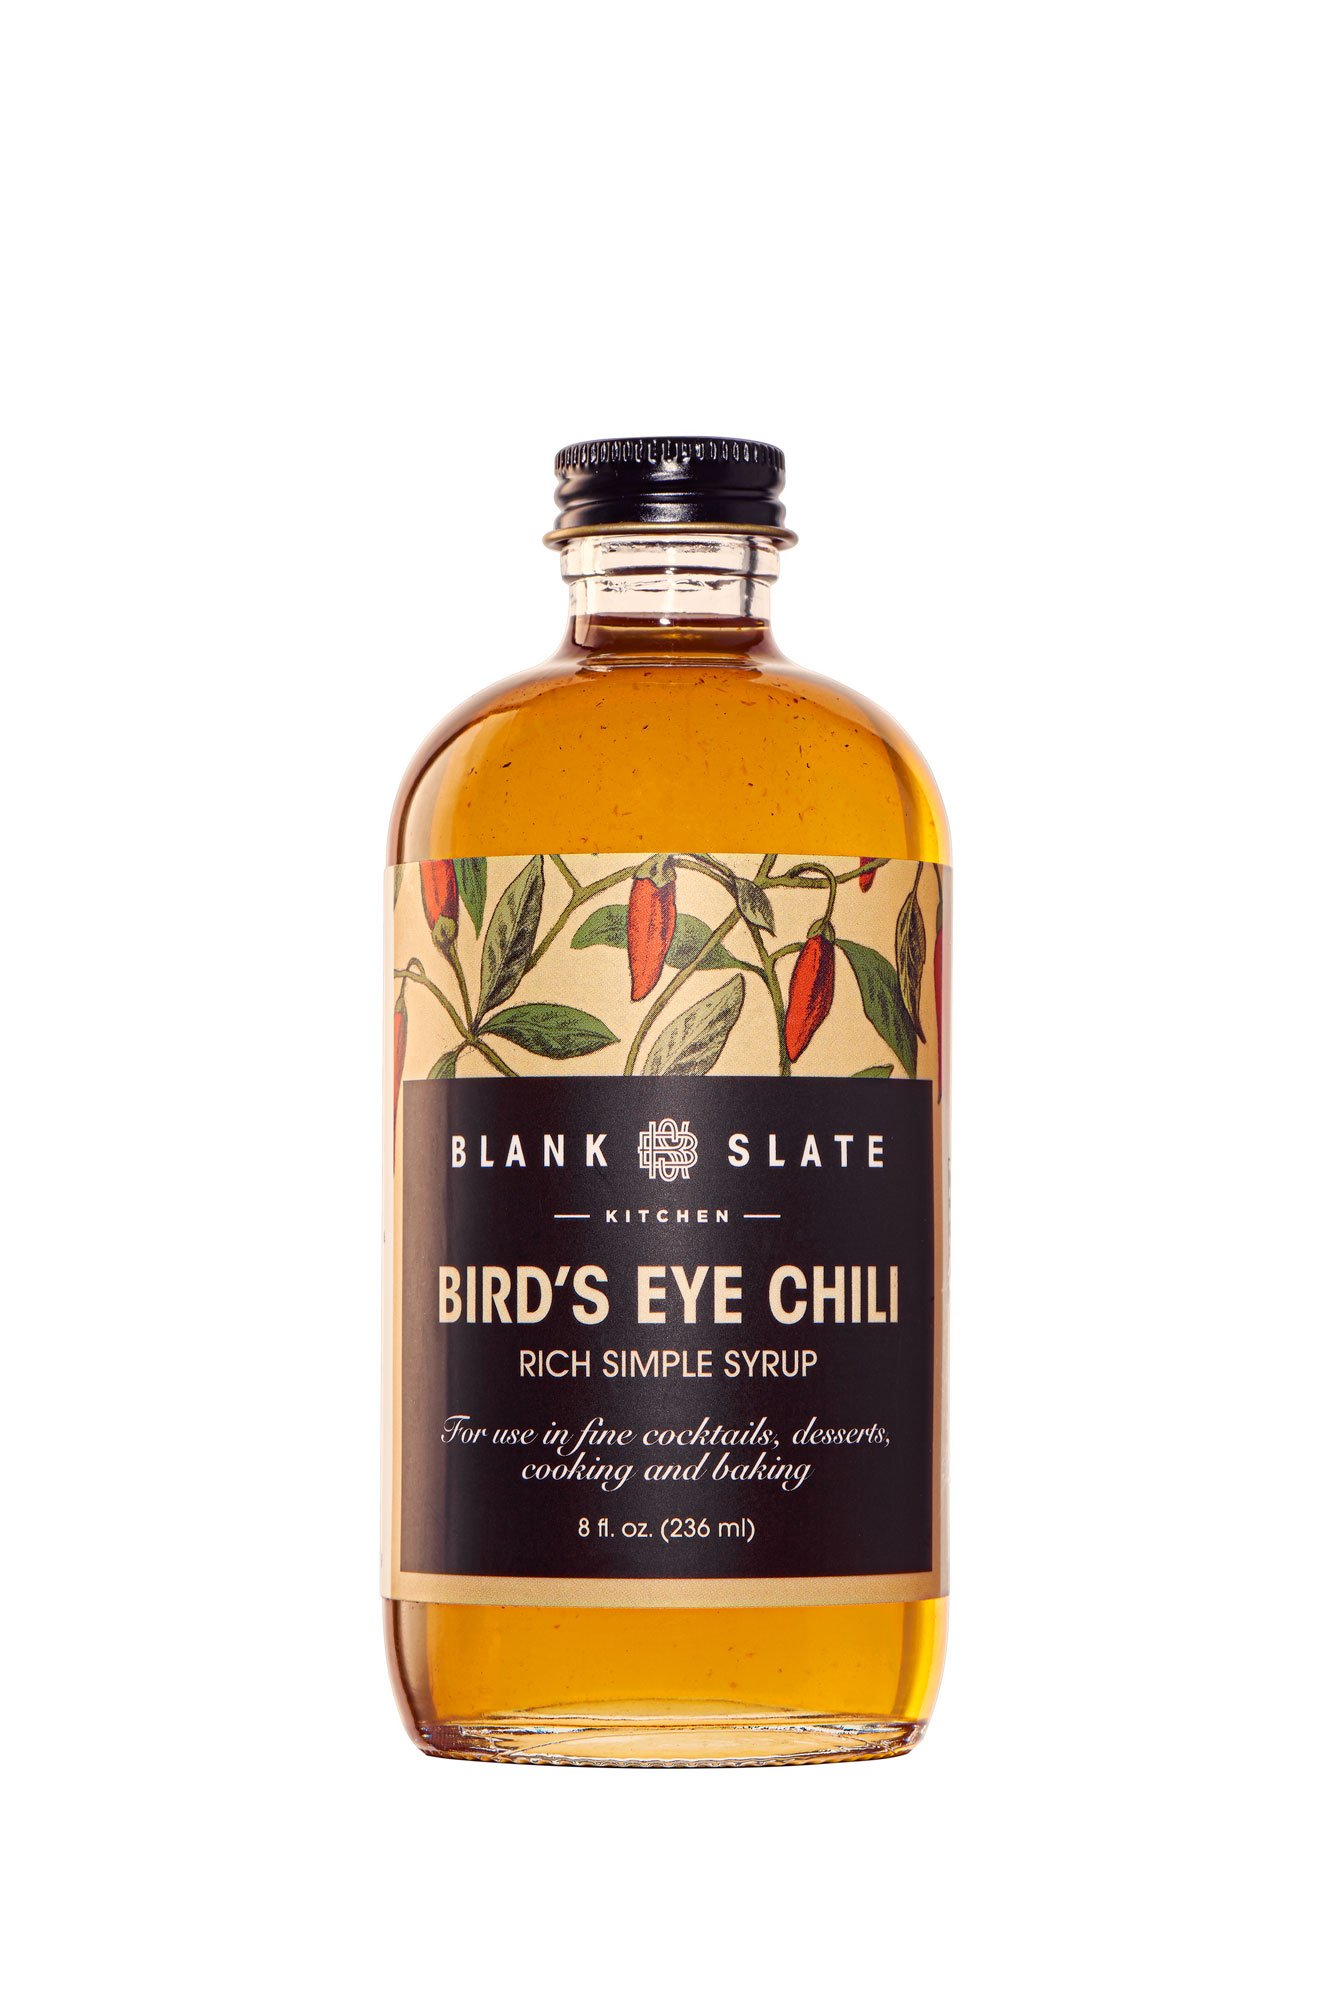 Bird's Eye Chili Rich Simple Syrup